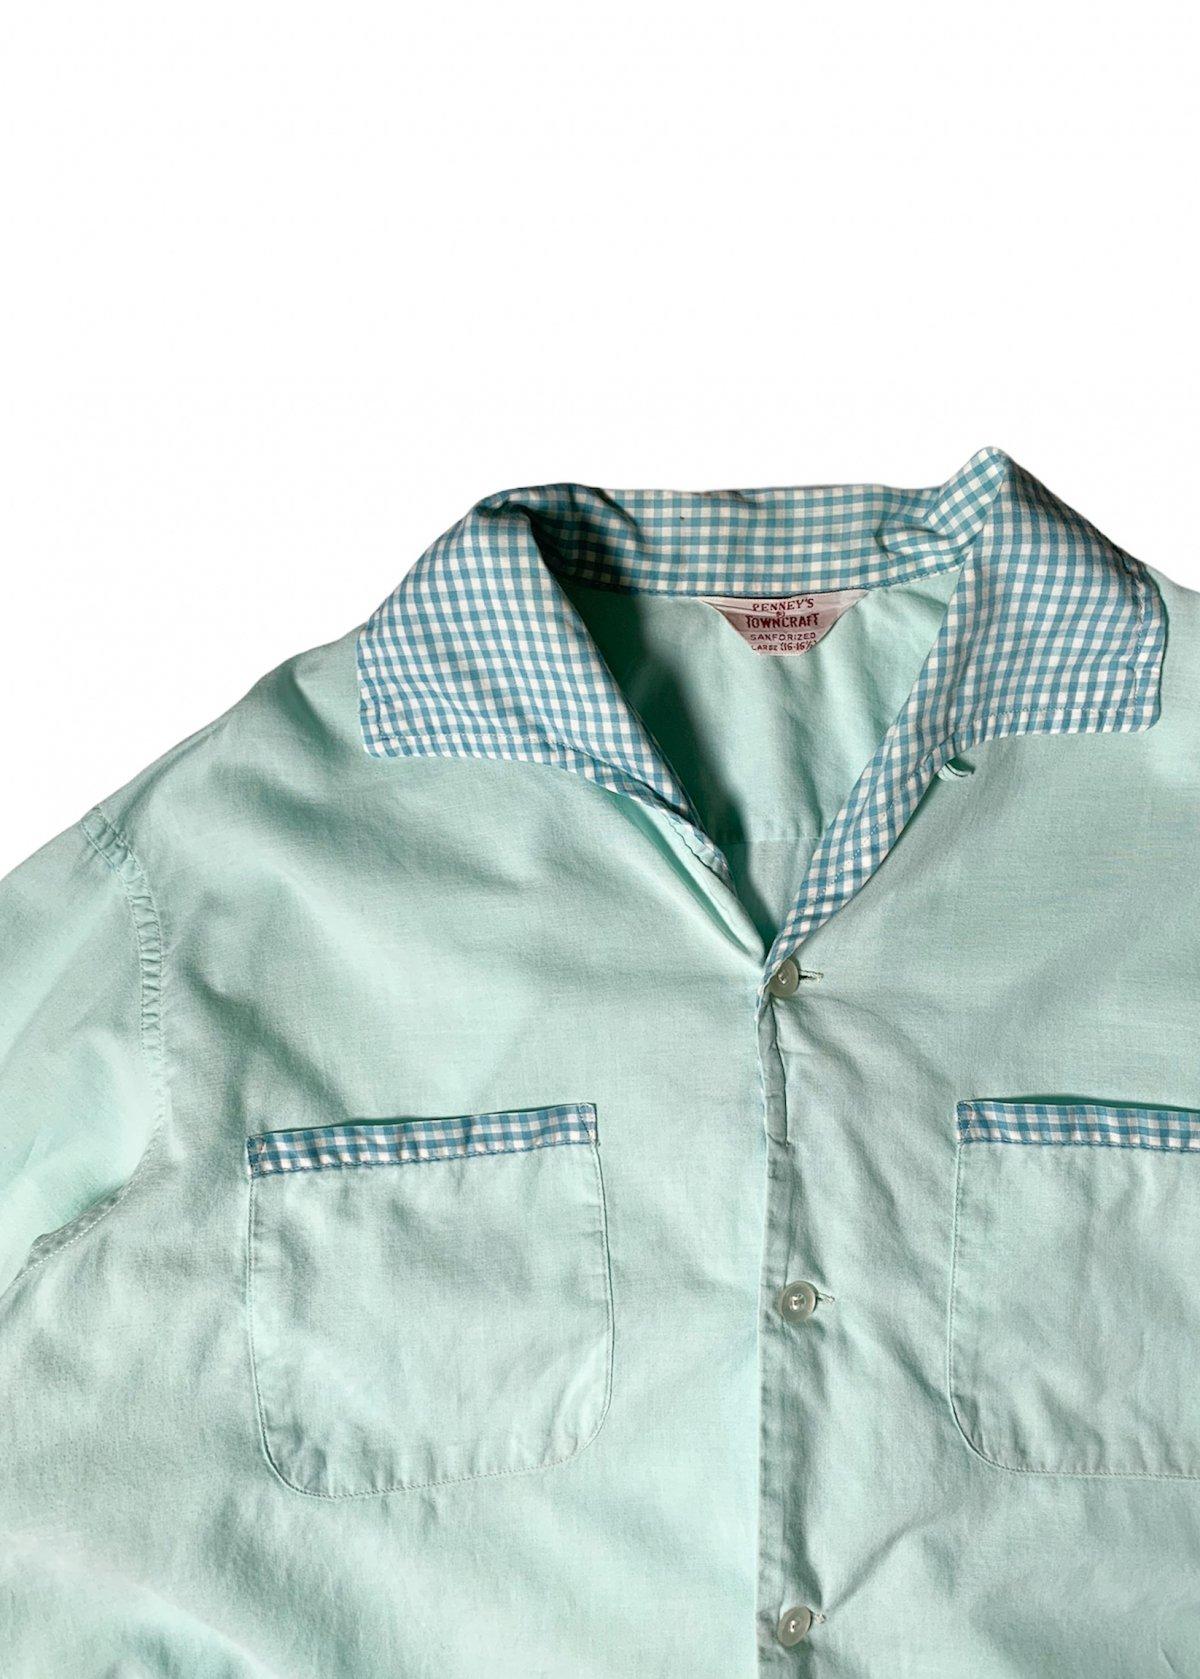 "I&I 古着 通販 ""PENNY'S TOWNCRAFT"" Pajama L/S Shirt 詳細画像3"